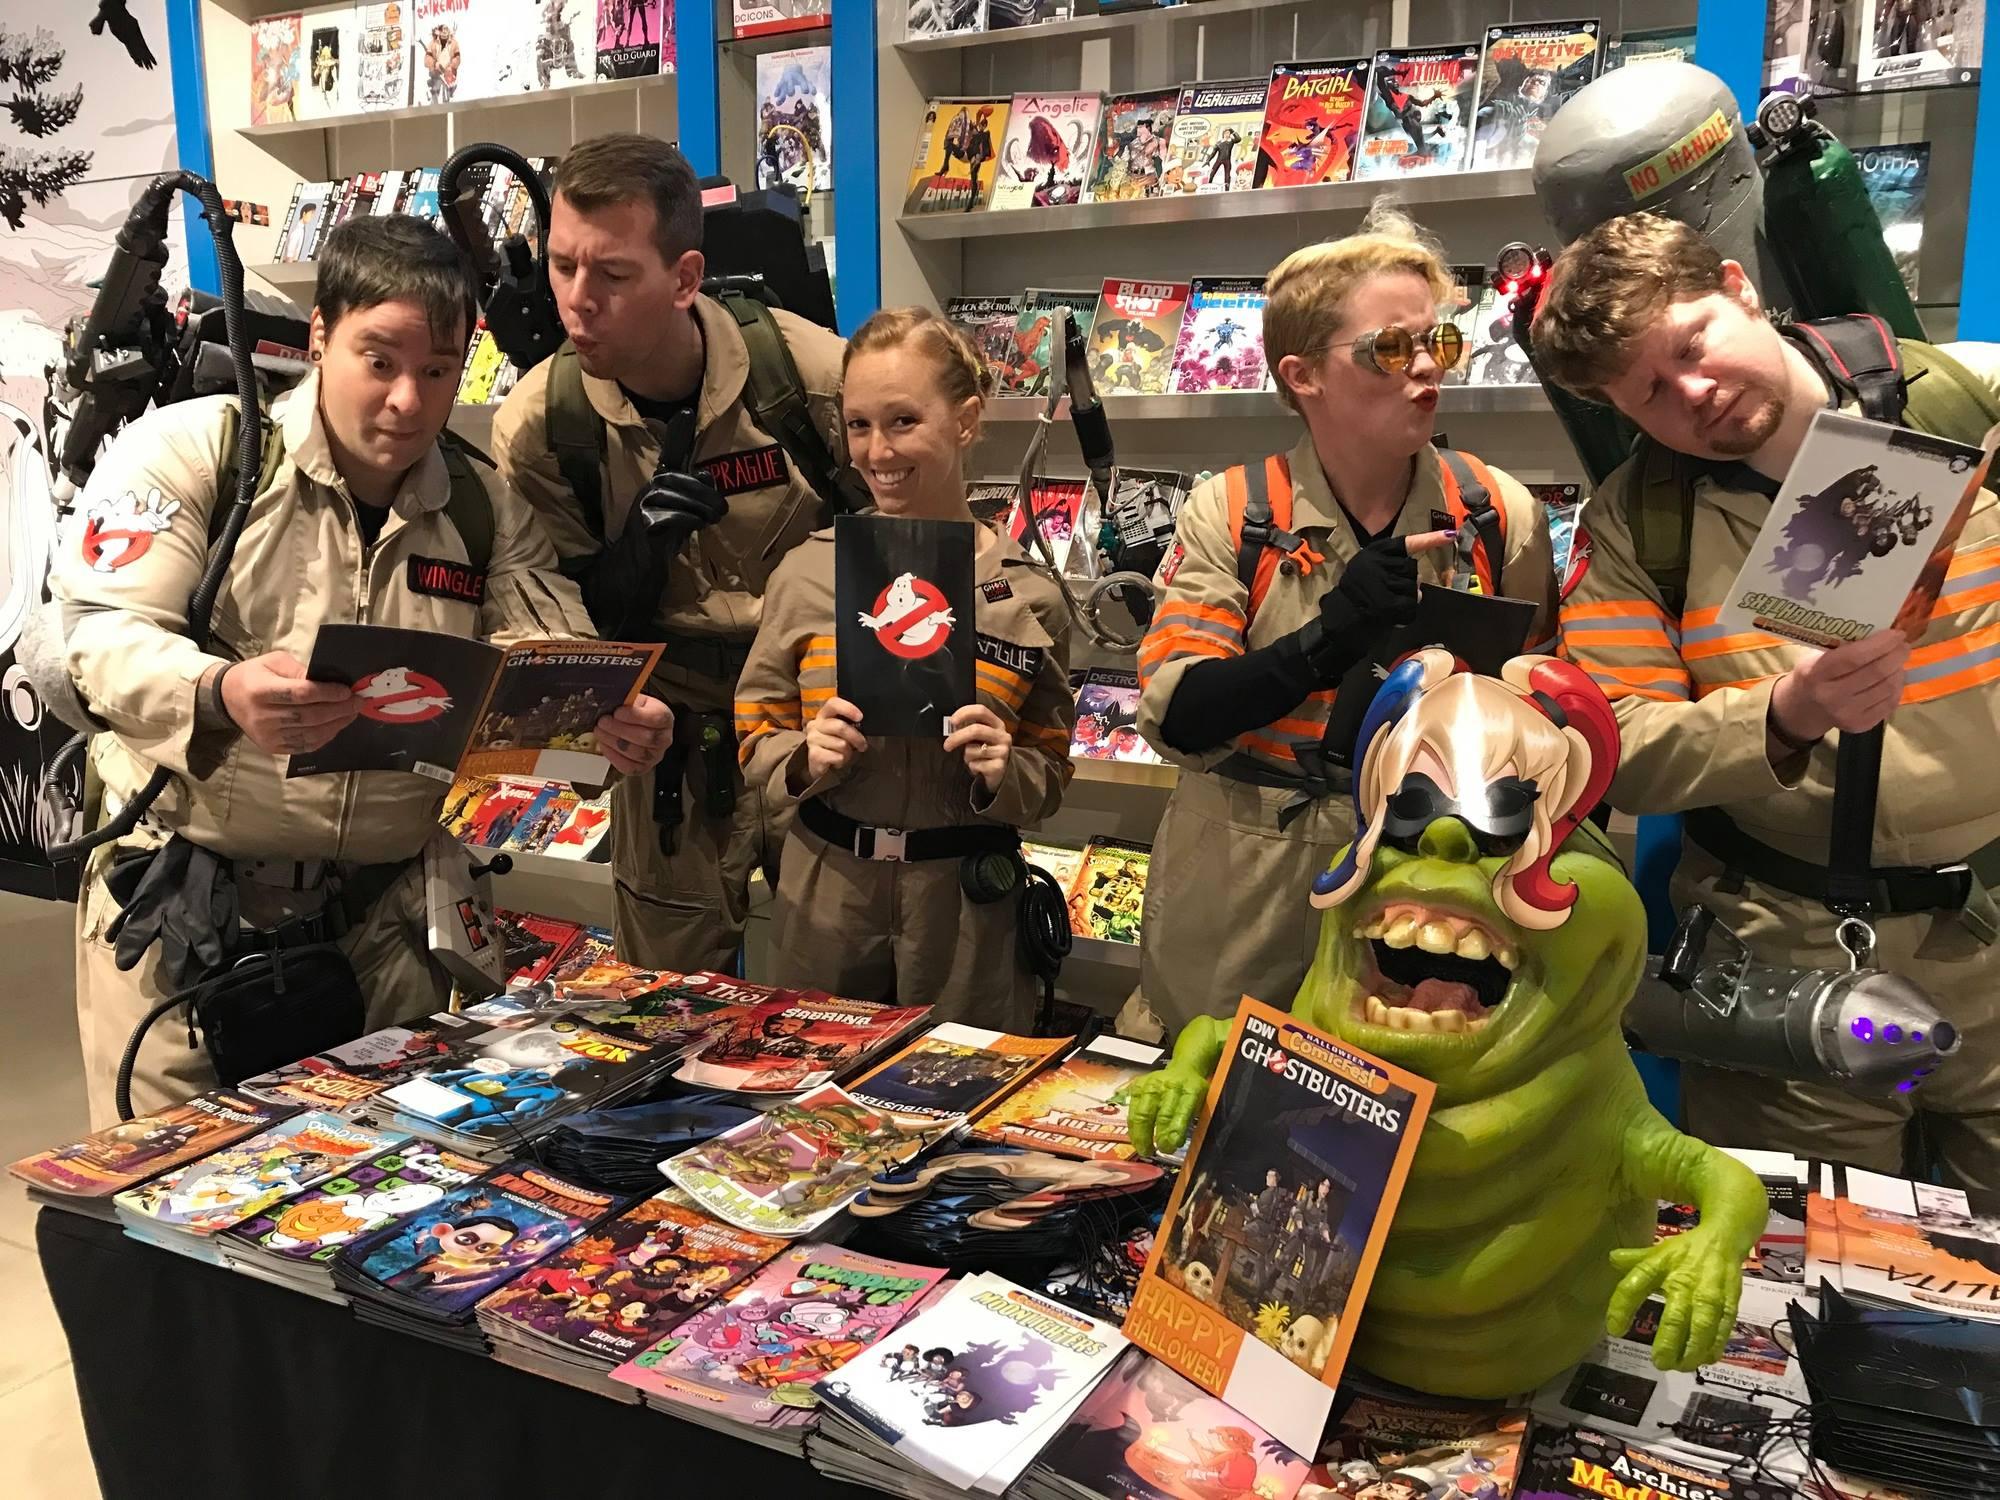 halloween conventions for halloween lovers - spooky little halloween